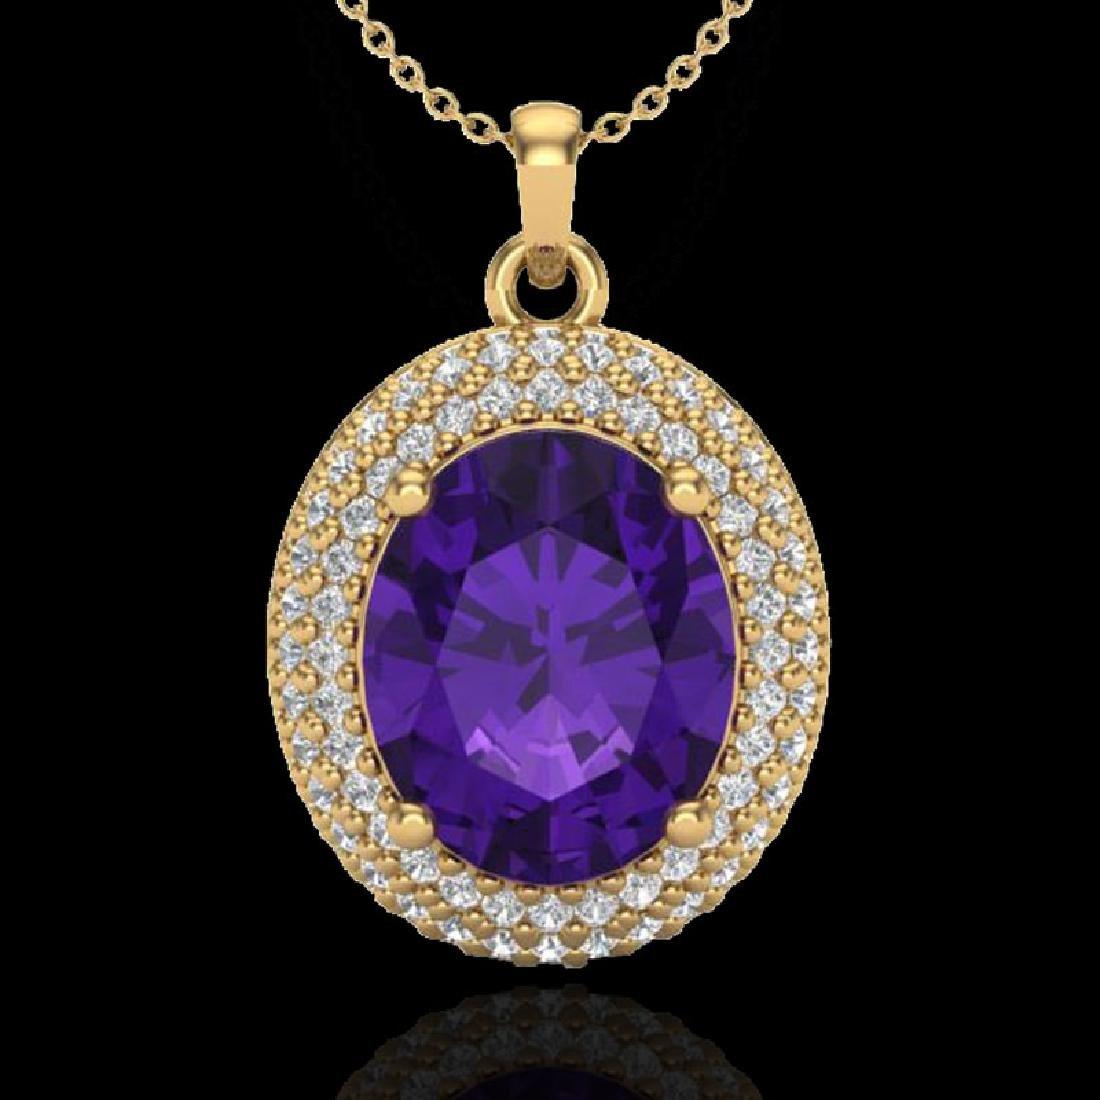 4 CTW Amethyst & Micro Pave VS/SI Diamond Necklace 18K